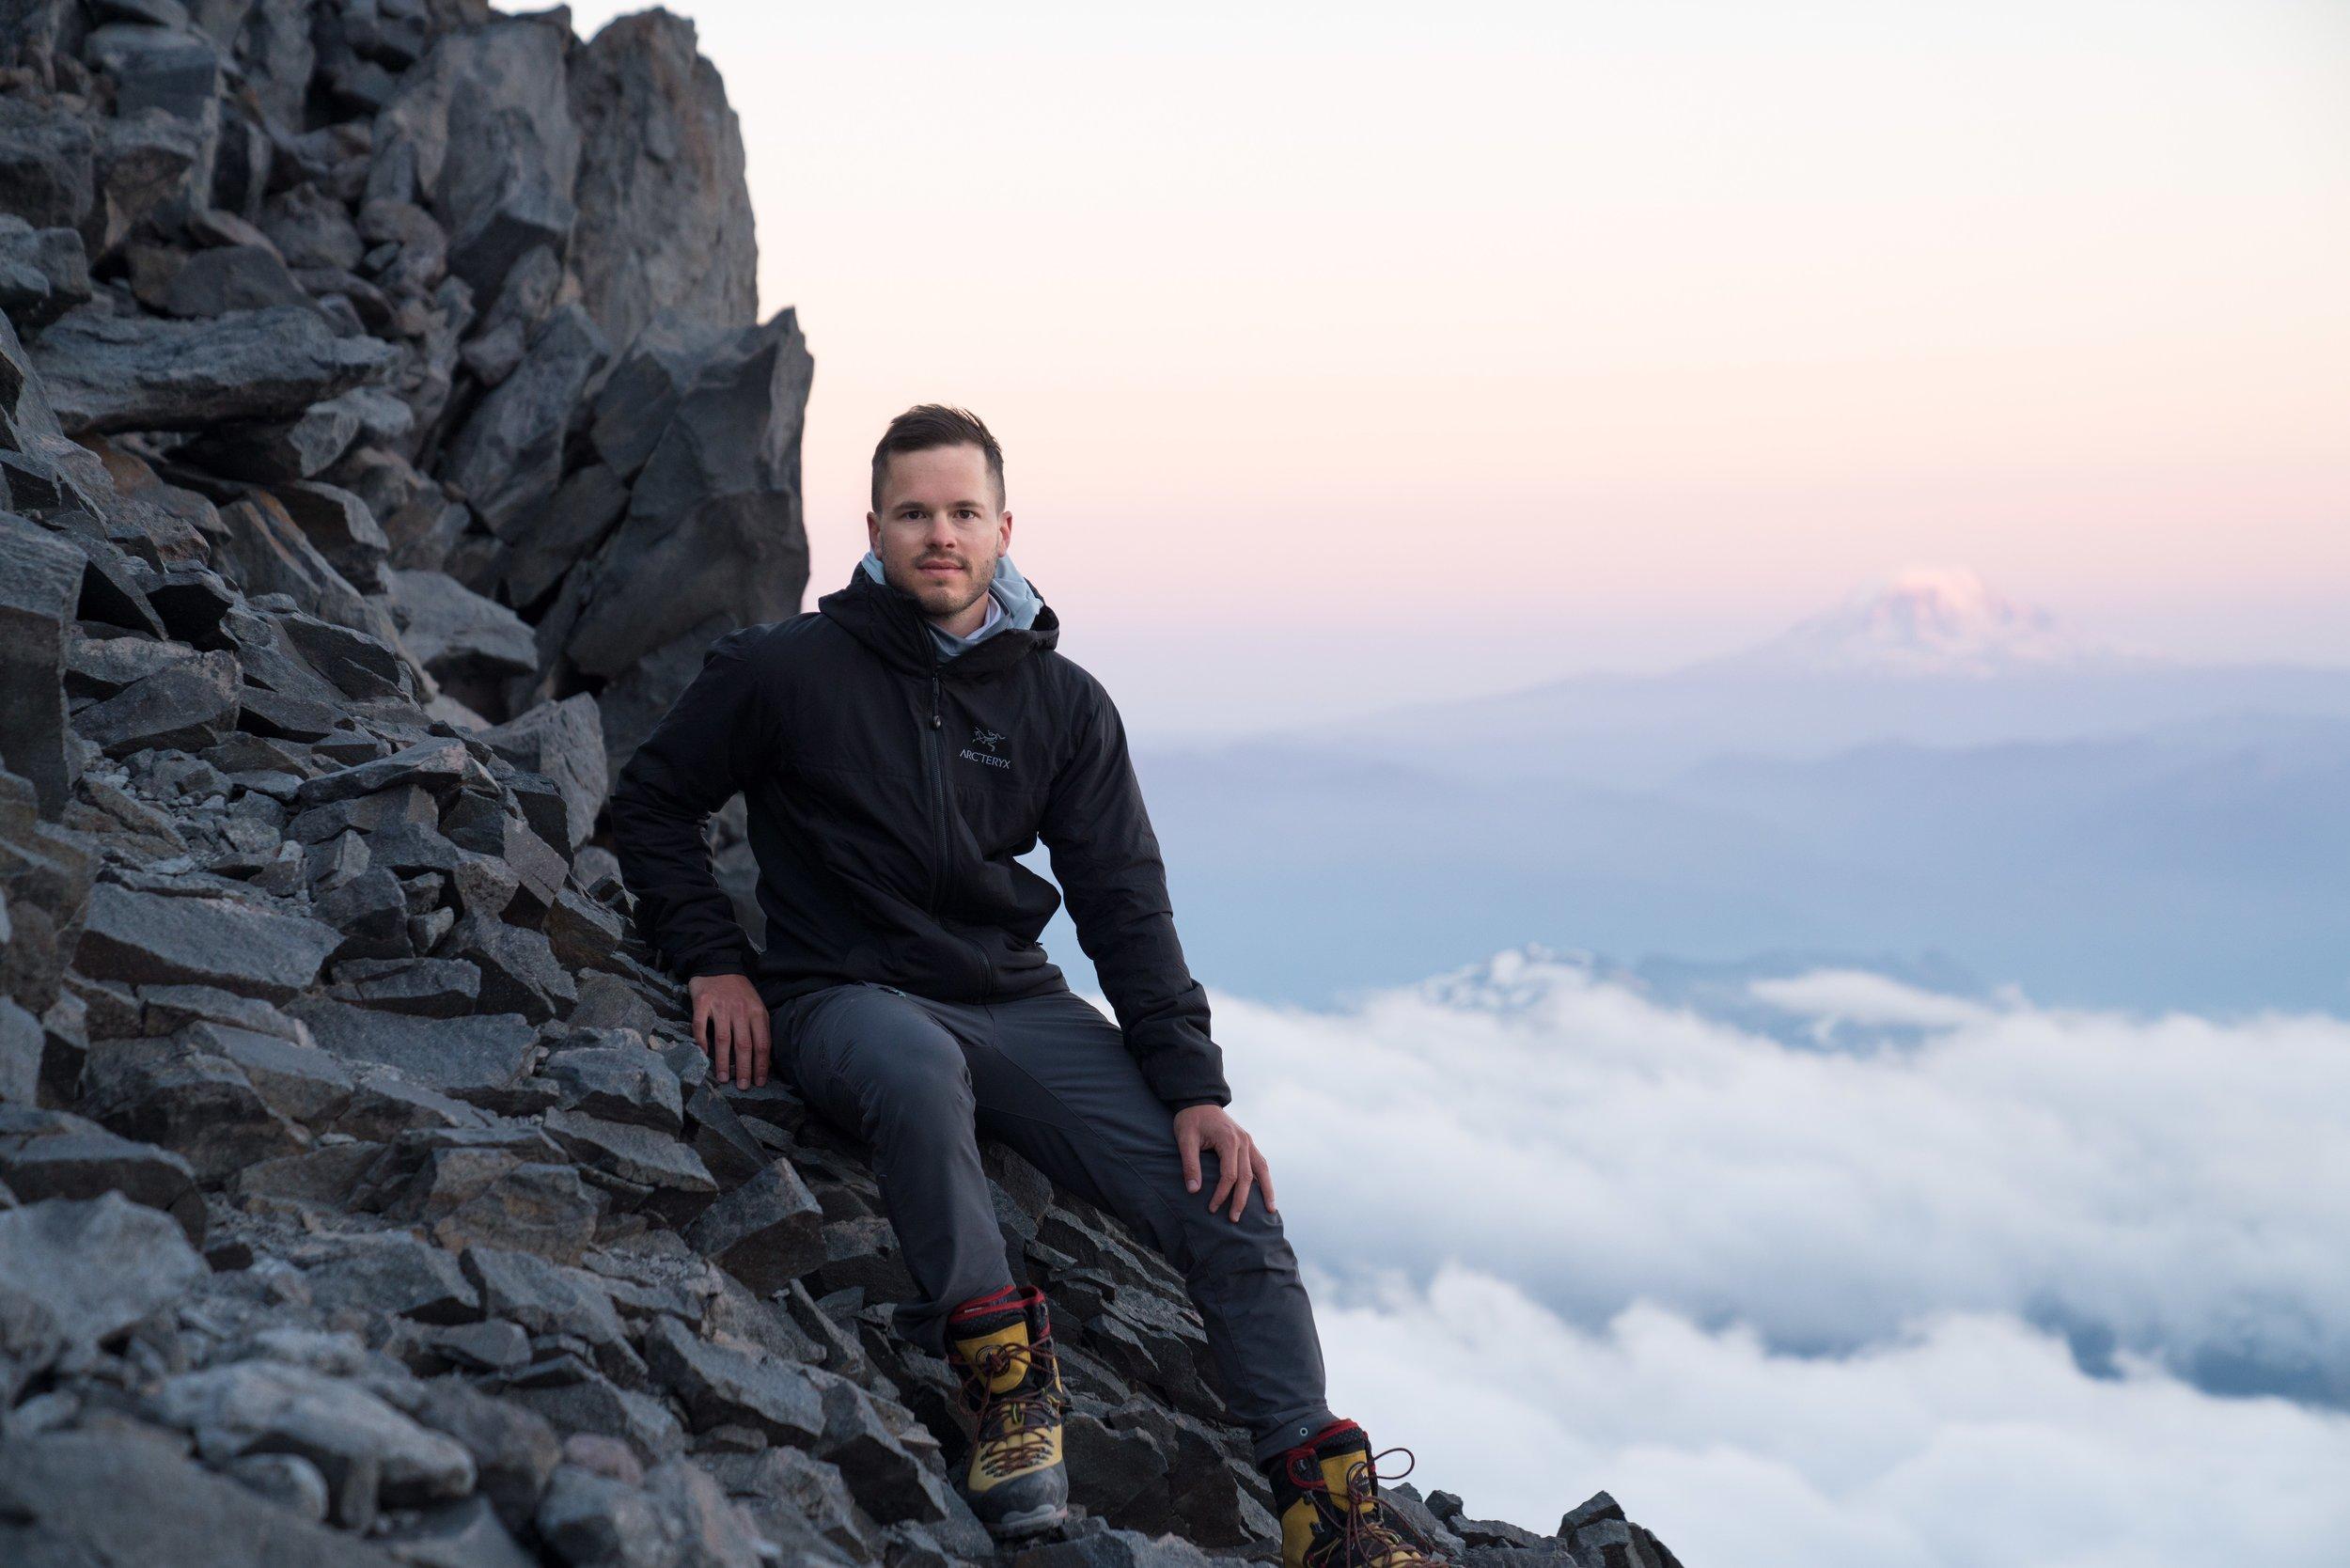 Climbing Mount Rainier, Washington